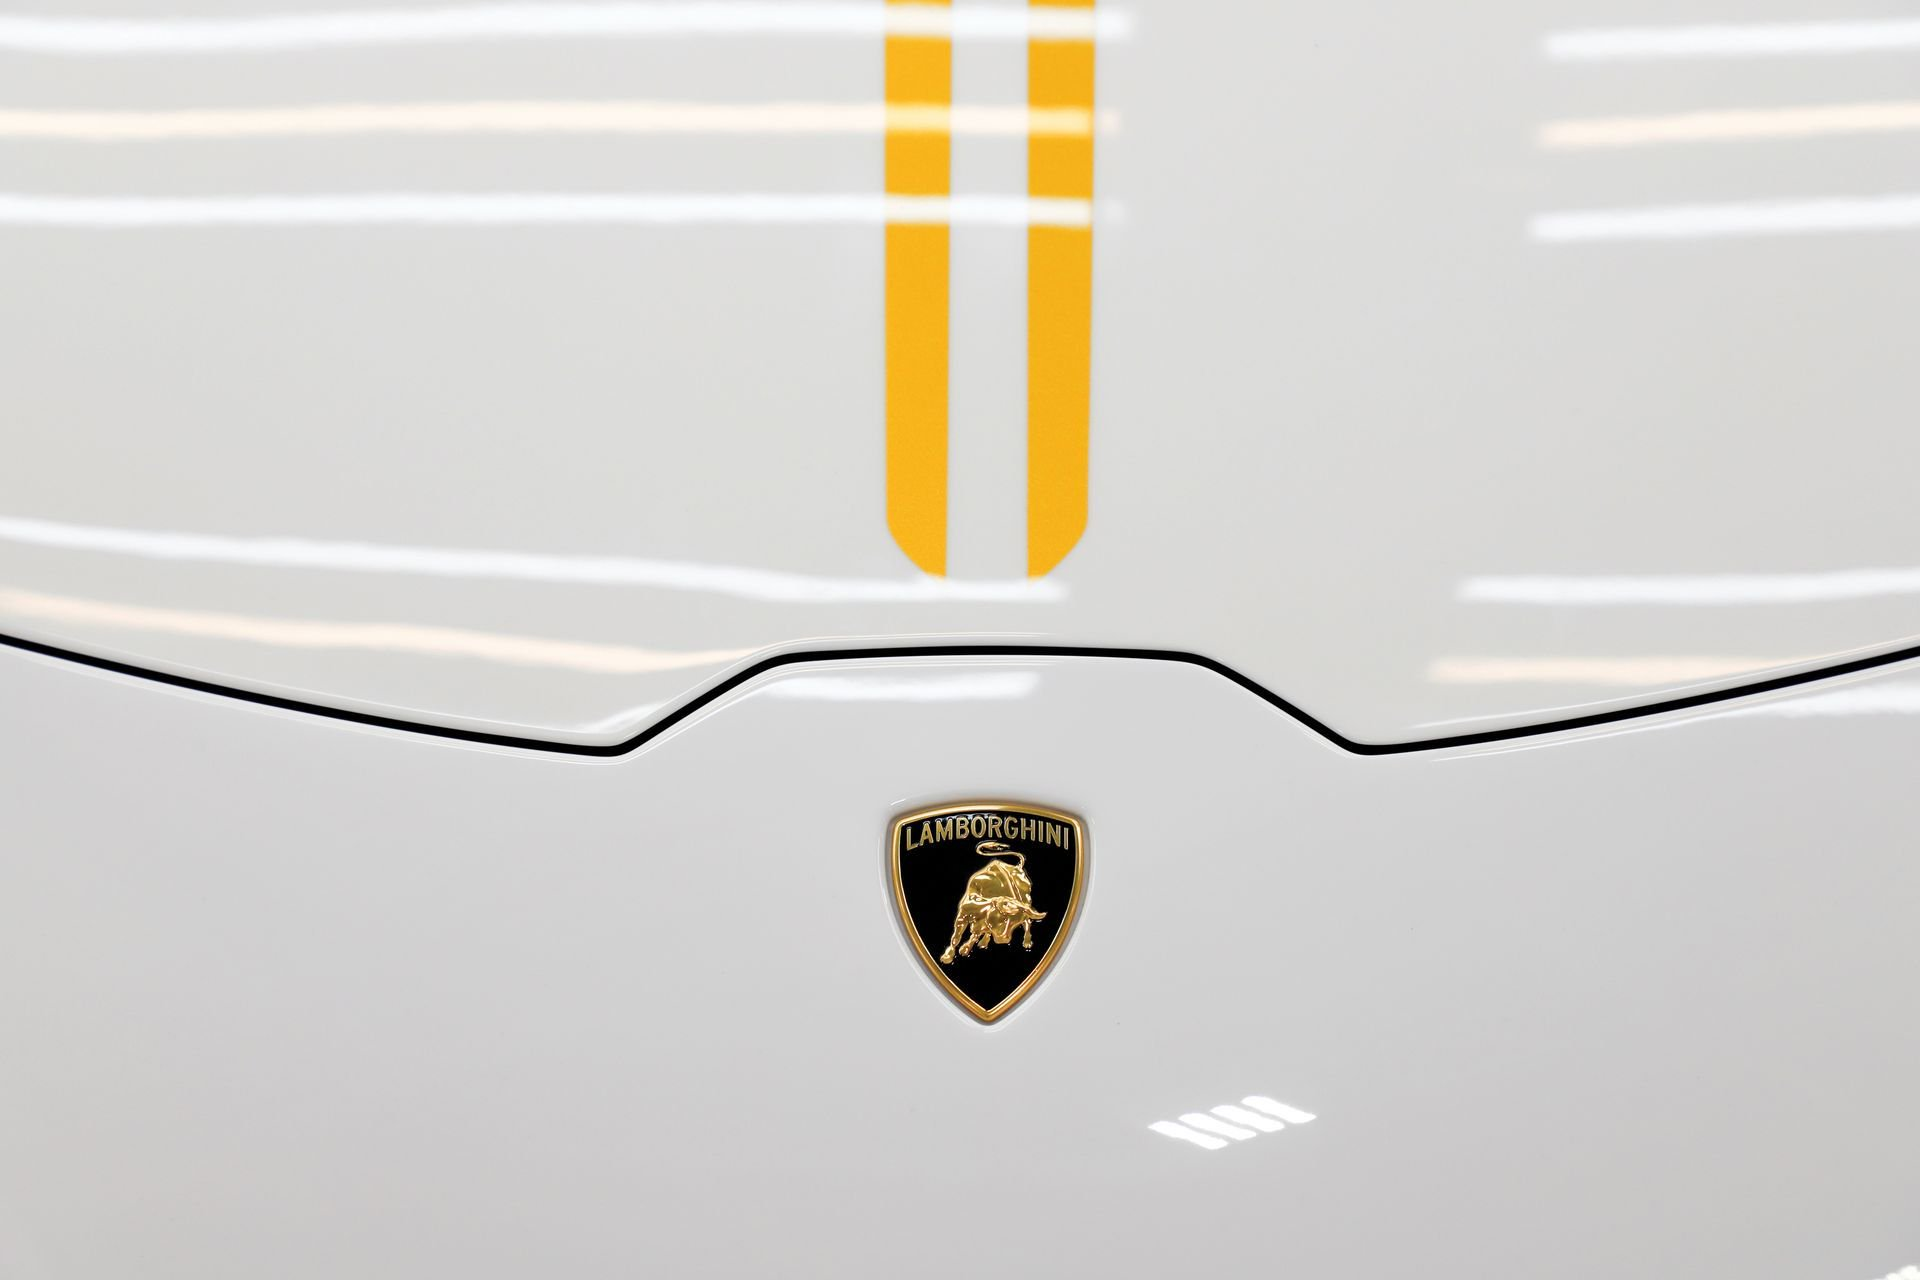 Pope-Lamborghini-Huracan-Auction-9.jpg